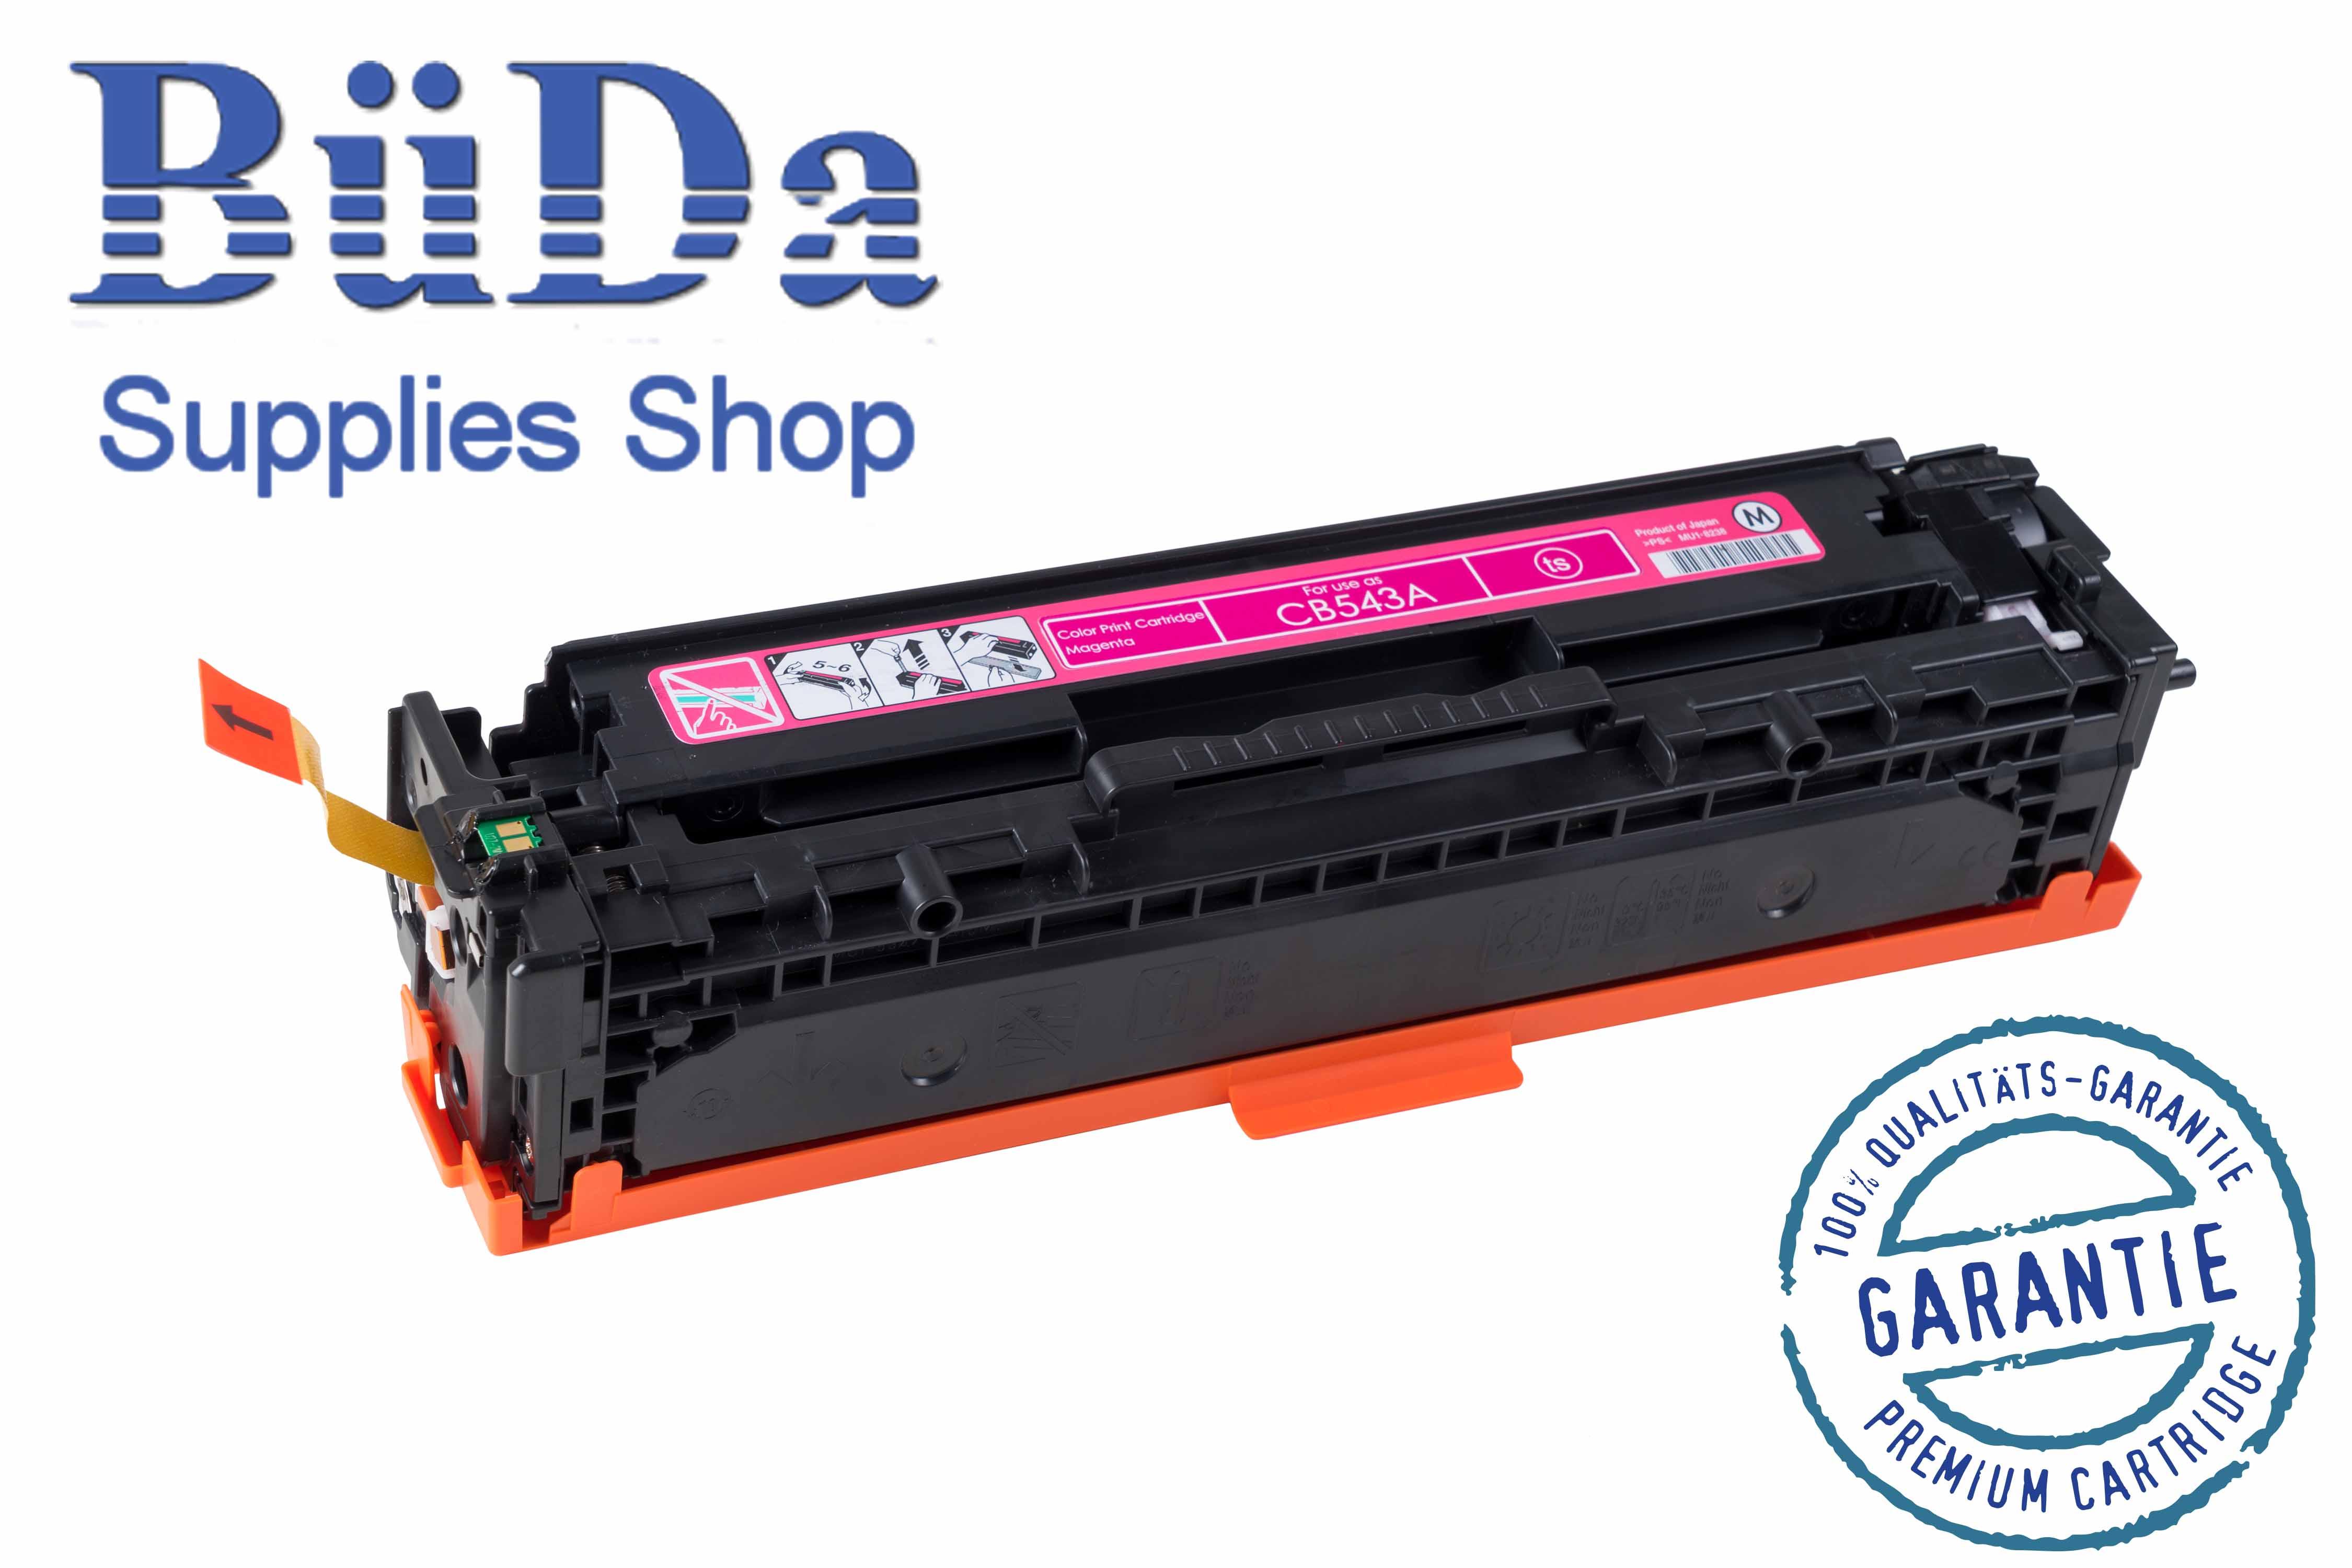 Toner-Modul komp. zu CB543A / Crt. 716M magenta 1400 Seiten